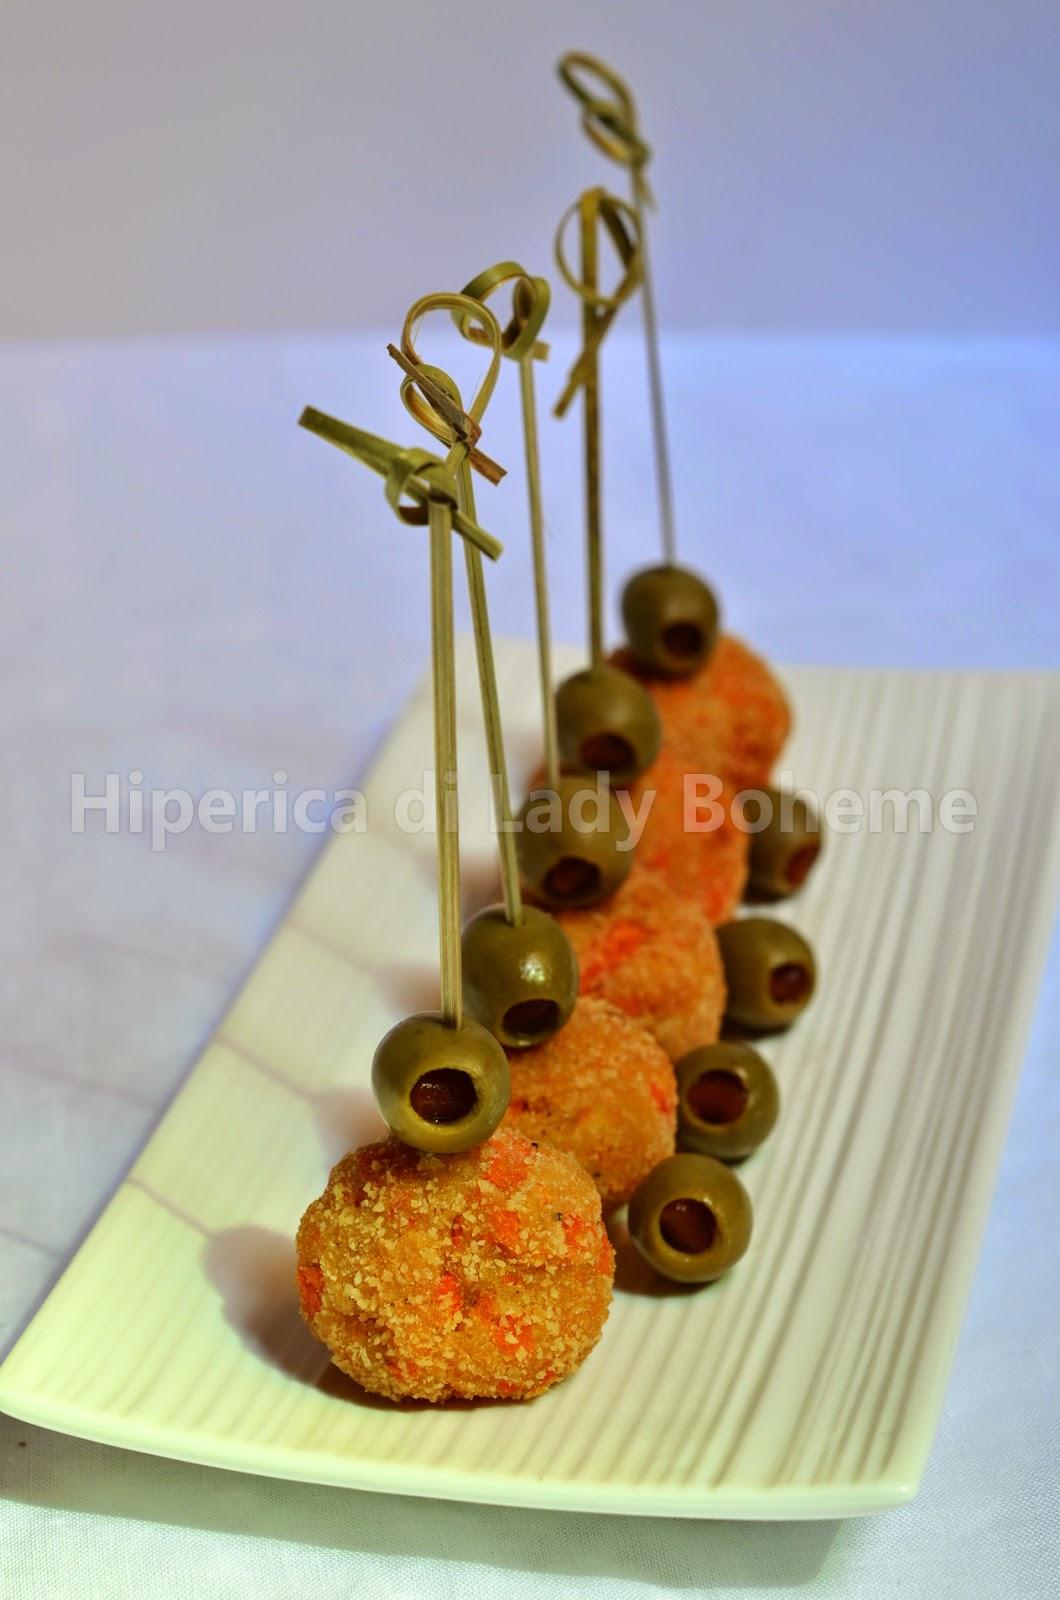 hiperica_lady_boheme_blog_cucina_ricette_gustose_facili_veloci_crocchette_di_patate_e_carote_1